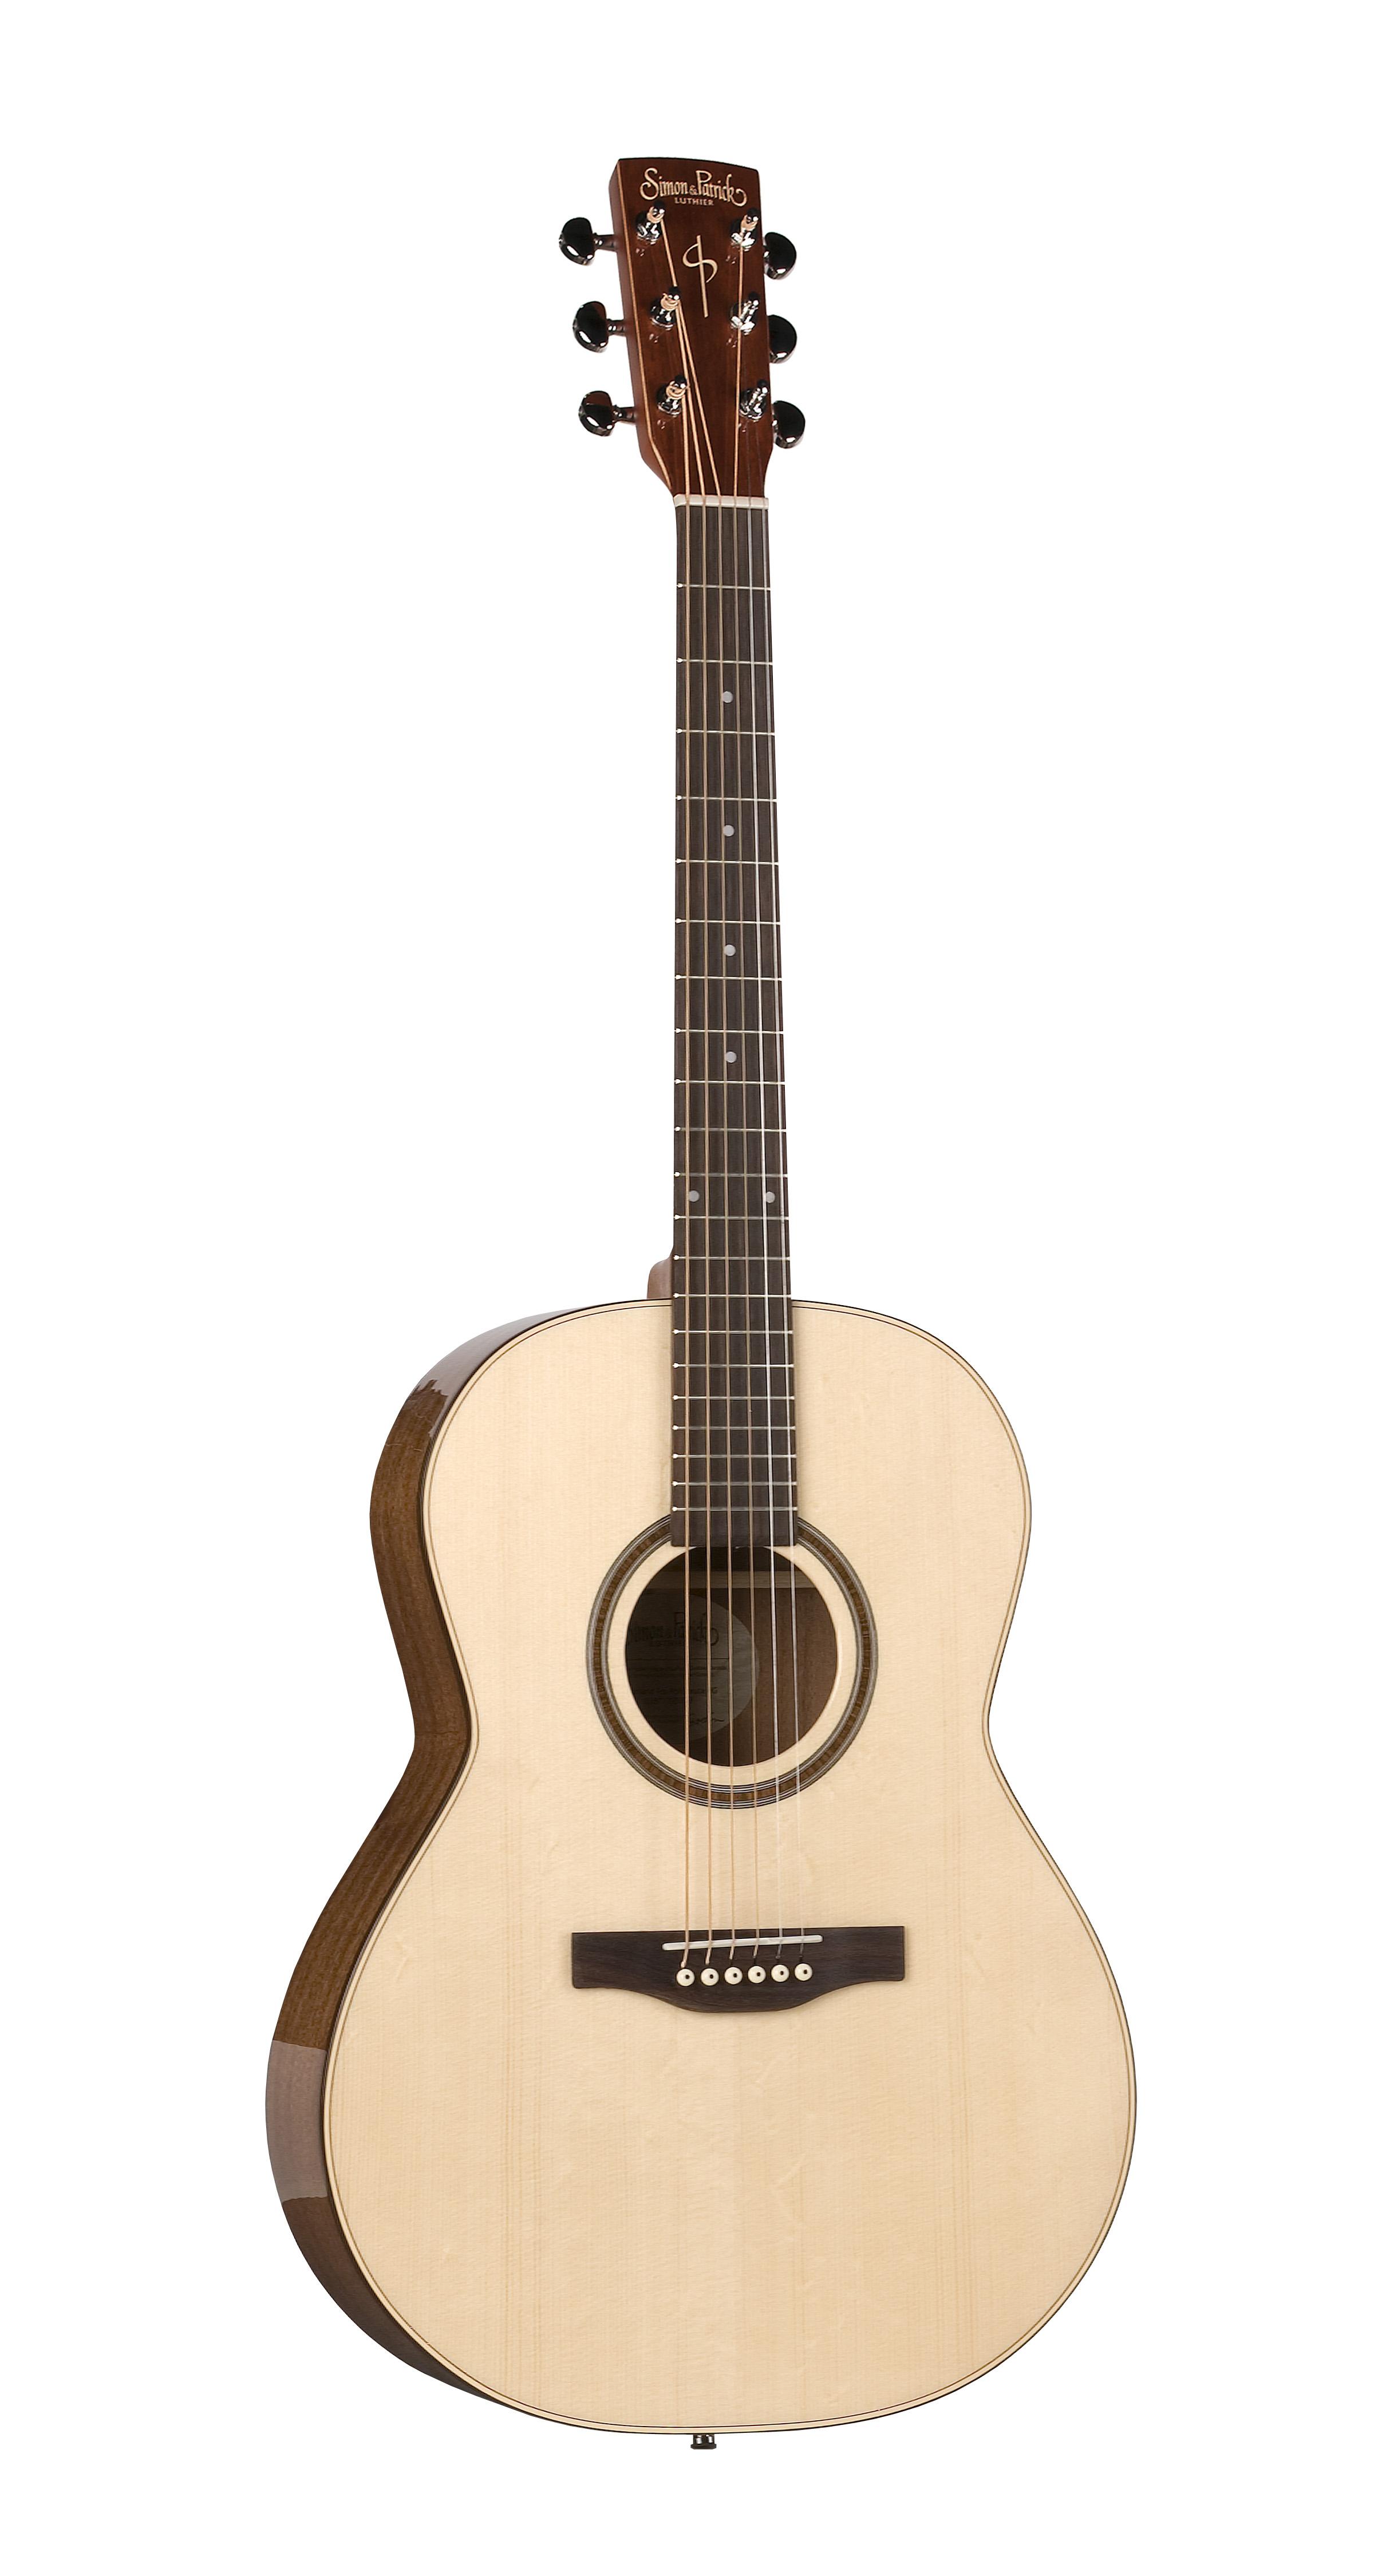 Simon & Patrick 33713 Woodland Pro Folk Spruce Acoustic Guitar